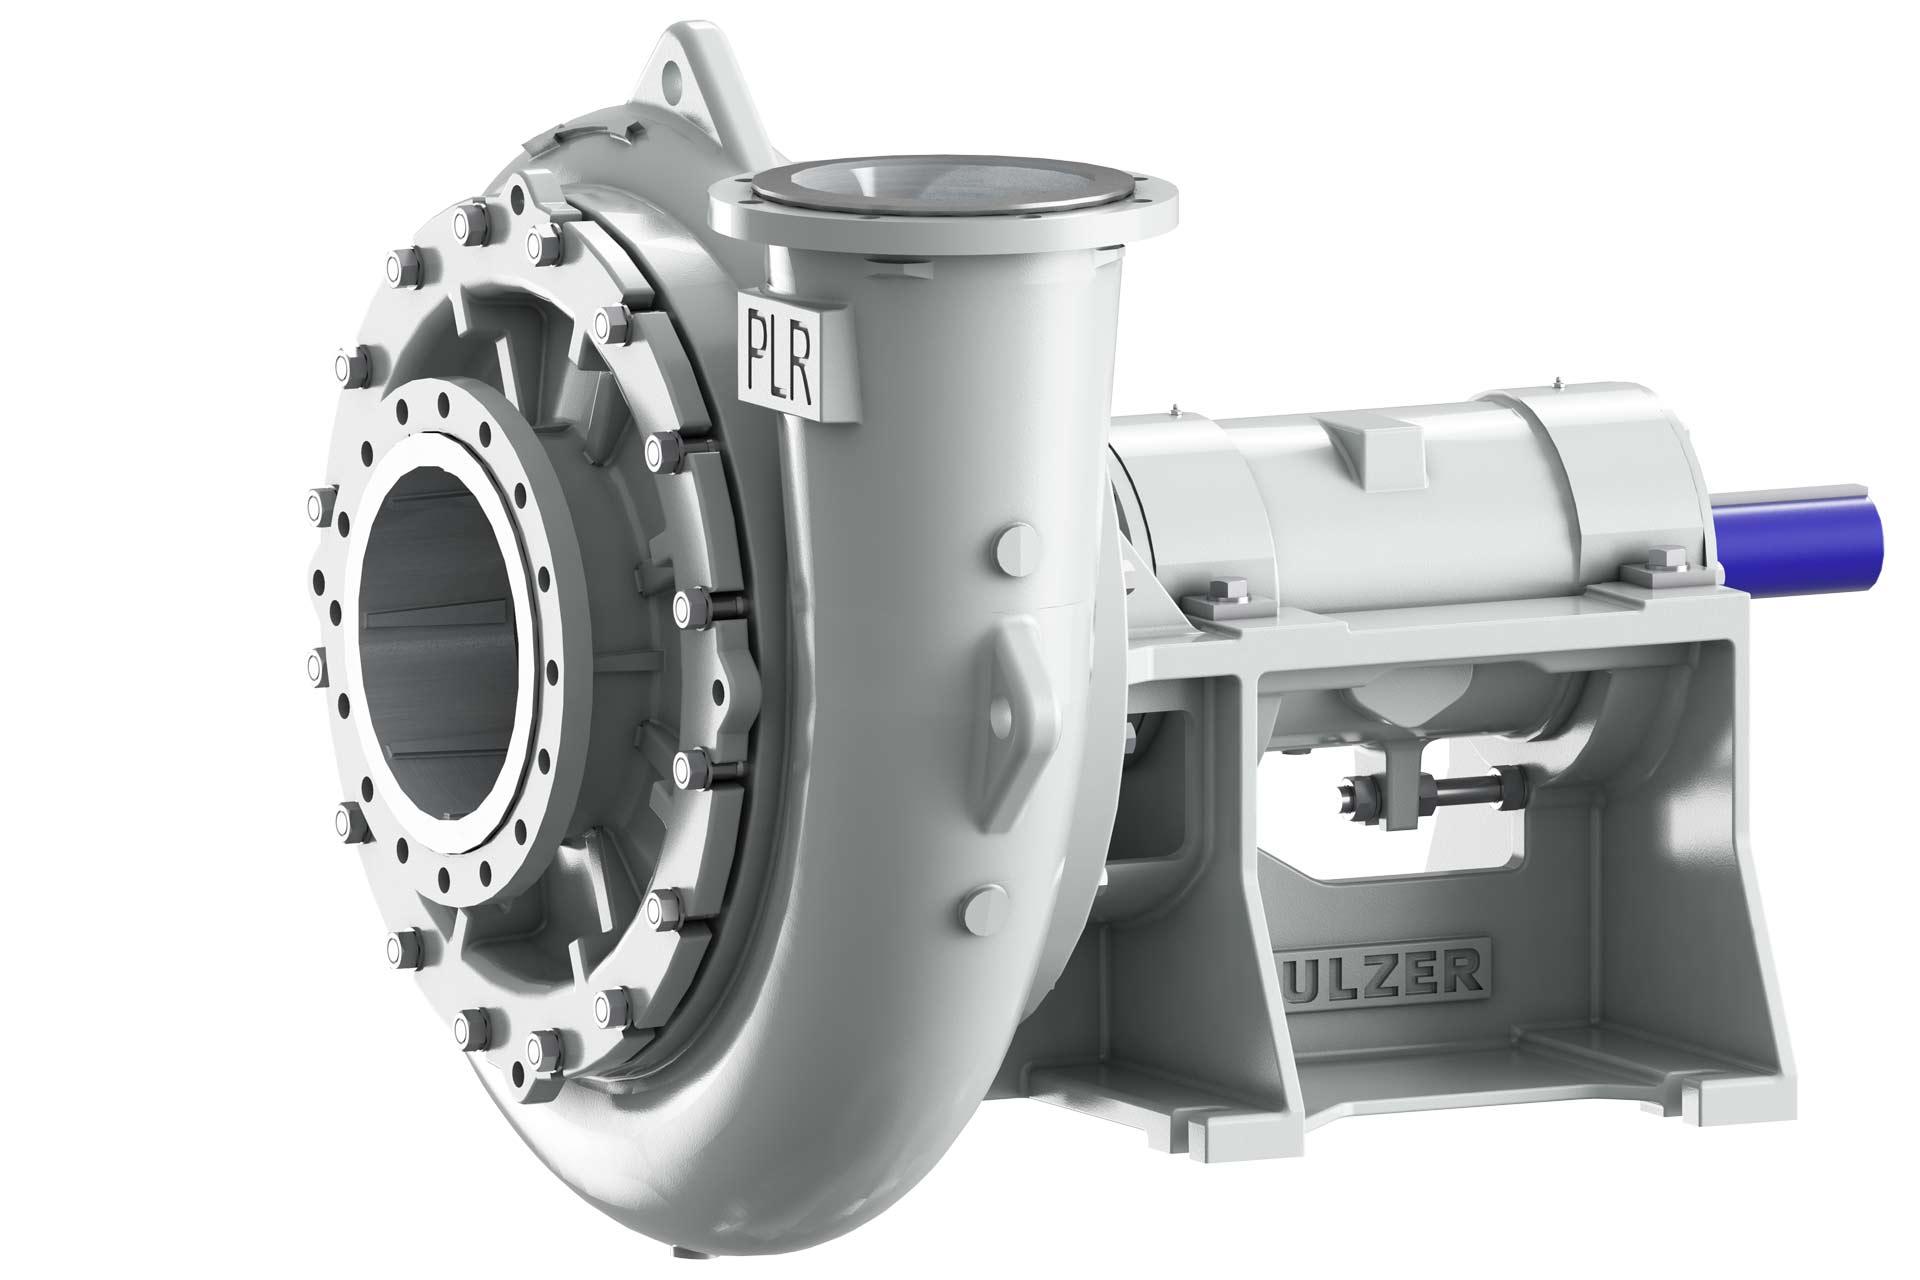 Slurry pump type Ensival Moret PLR and CR